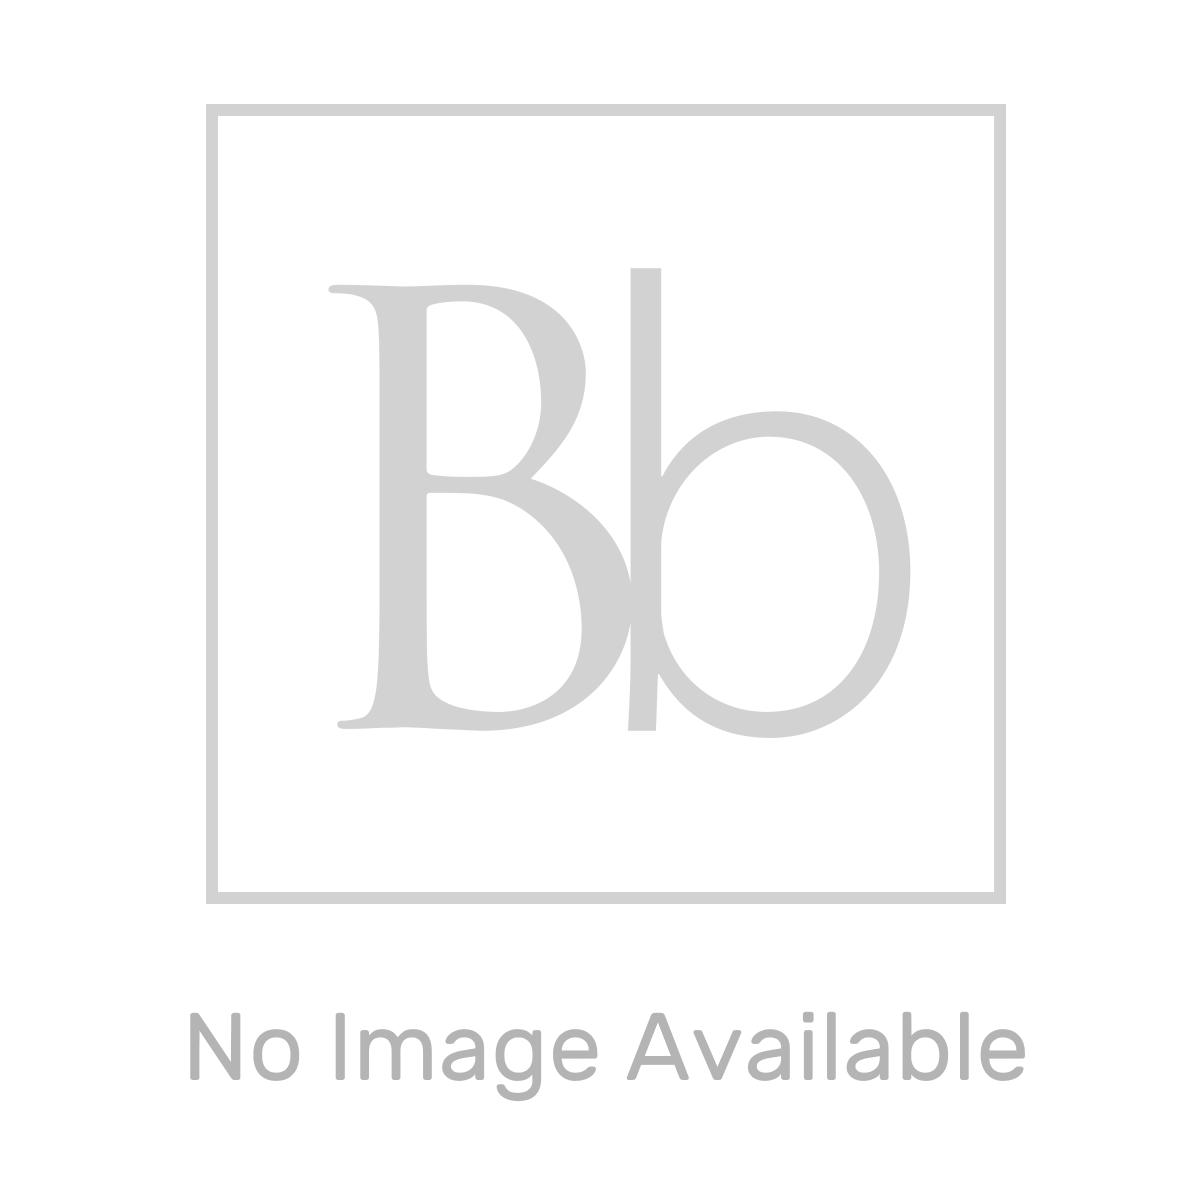 Aquadart Rectangular 1400 x 760 Shower Tray